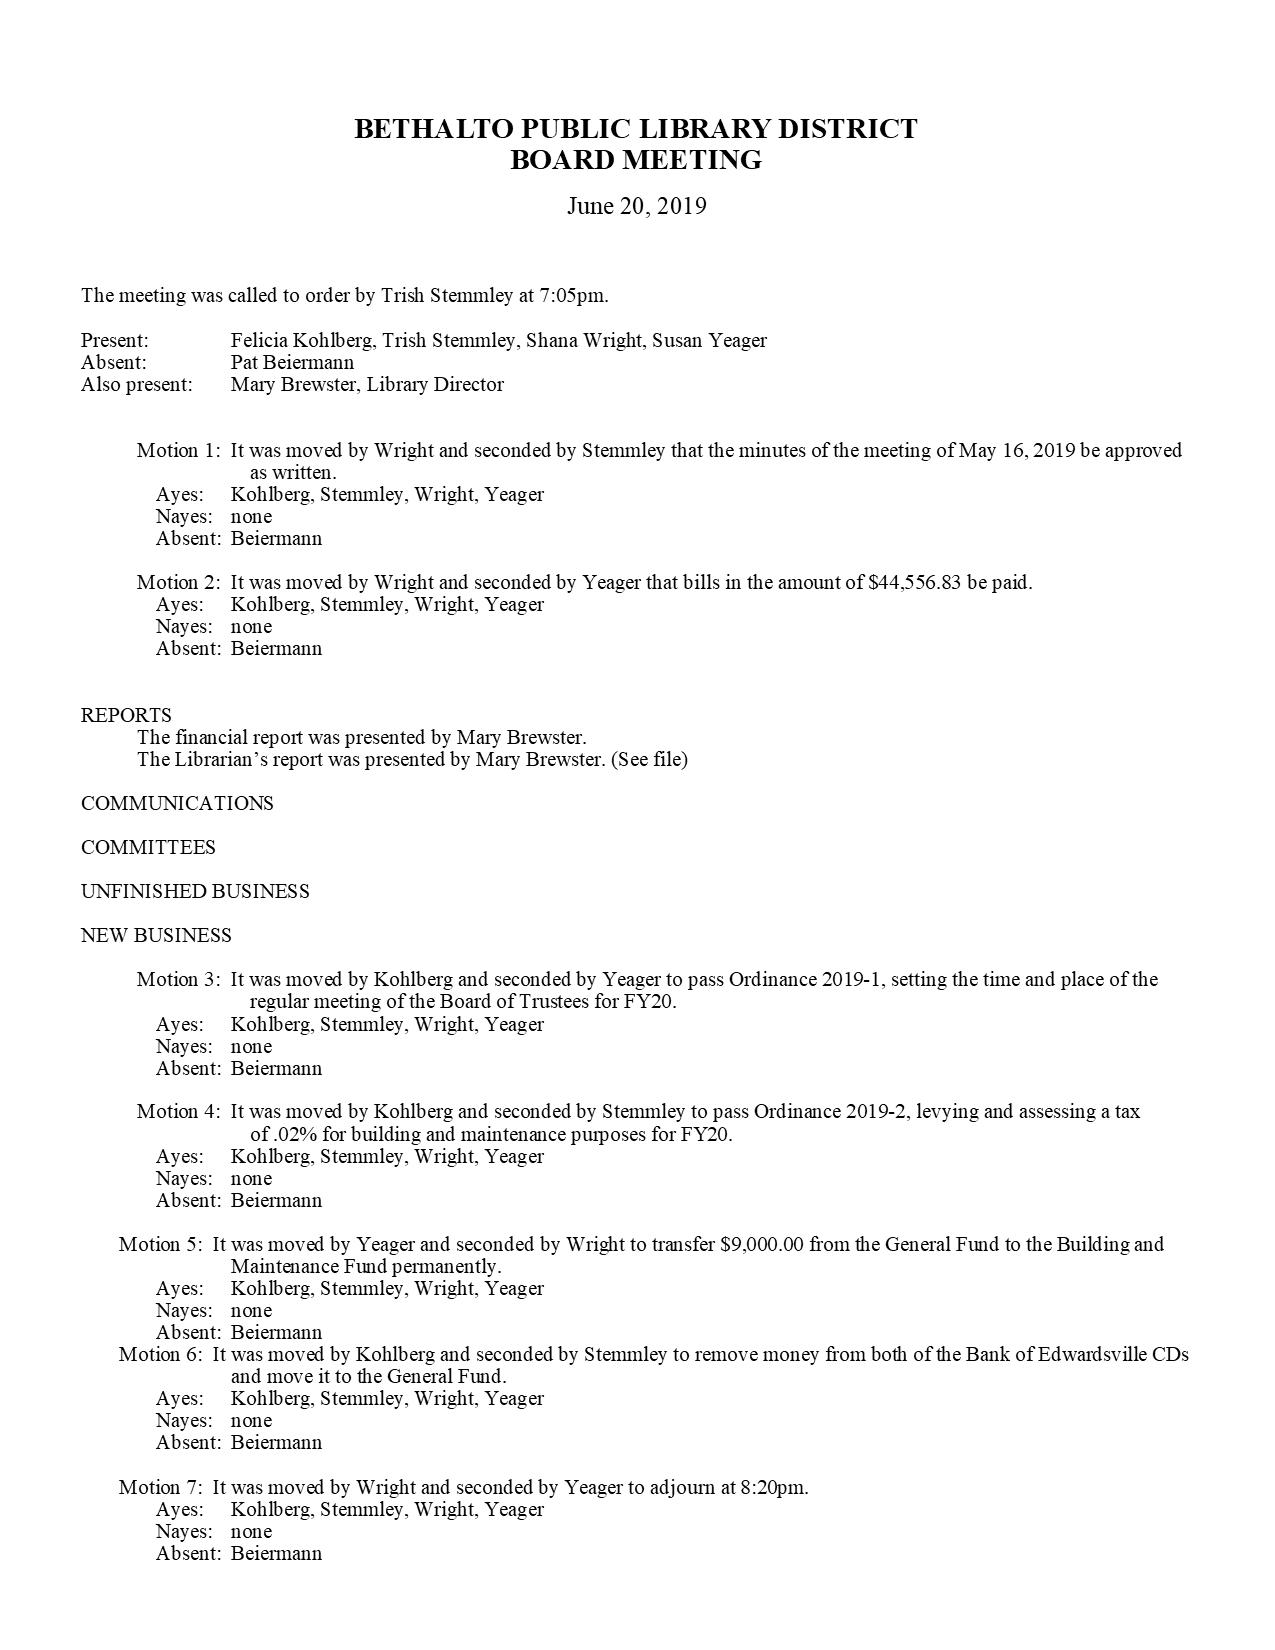 June 20, 2019 Board Minutes